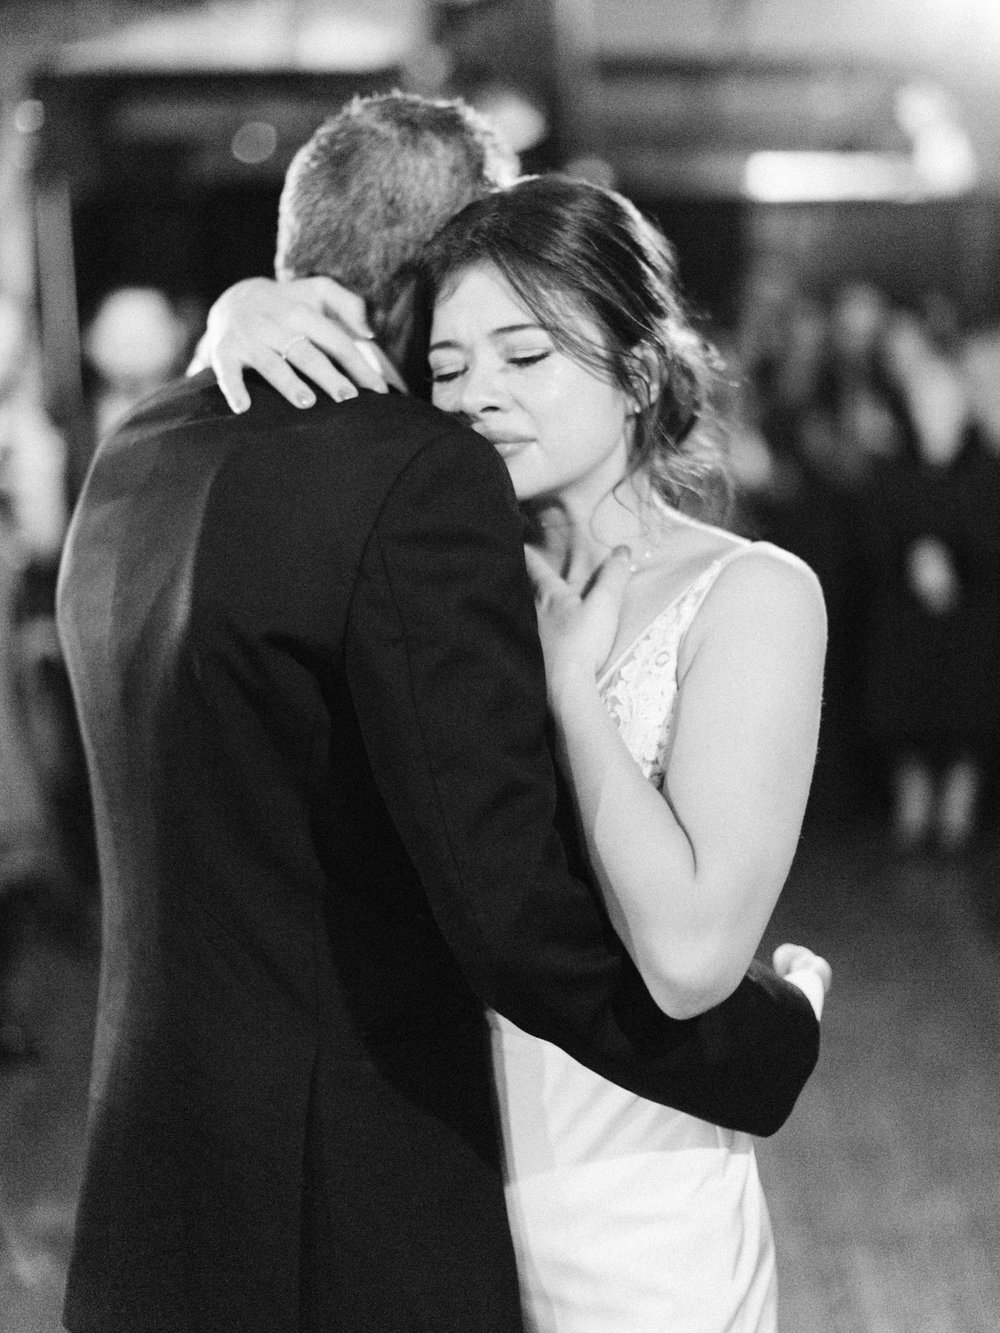 Toronto-wedding-photographer-intimate-italian-the-burroughes-downtown160.jpg